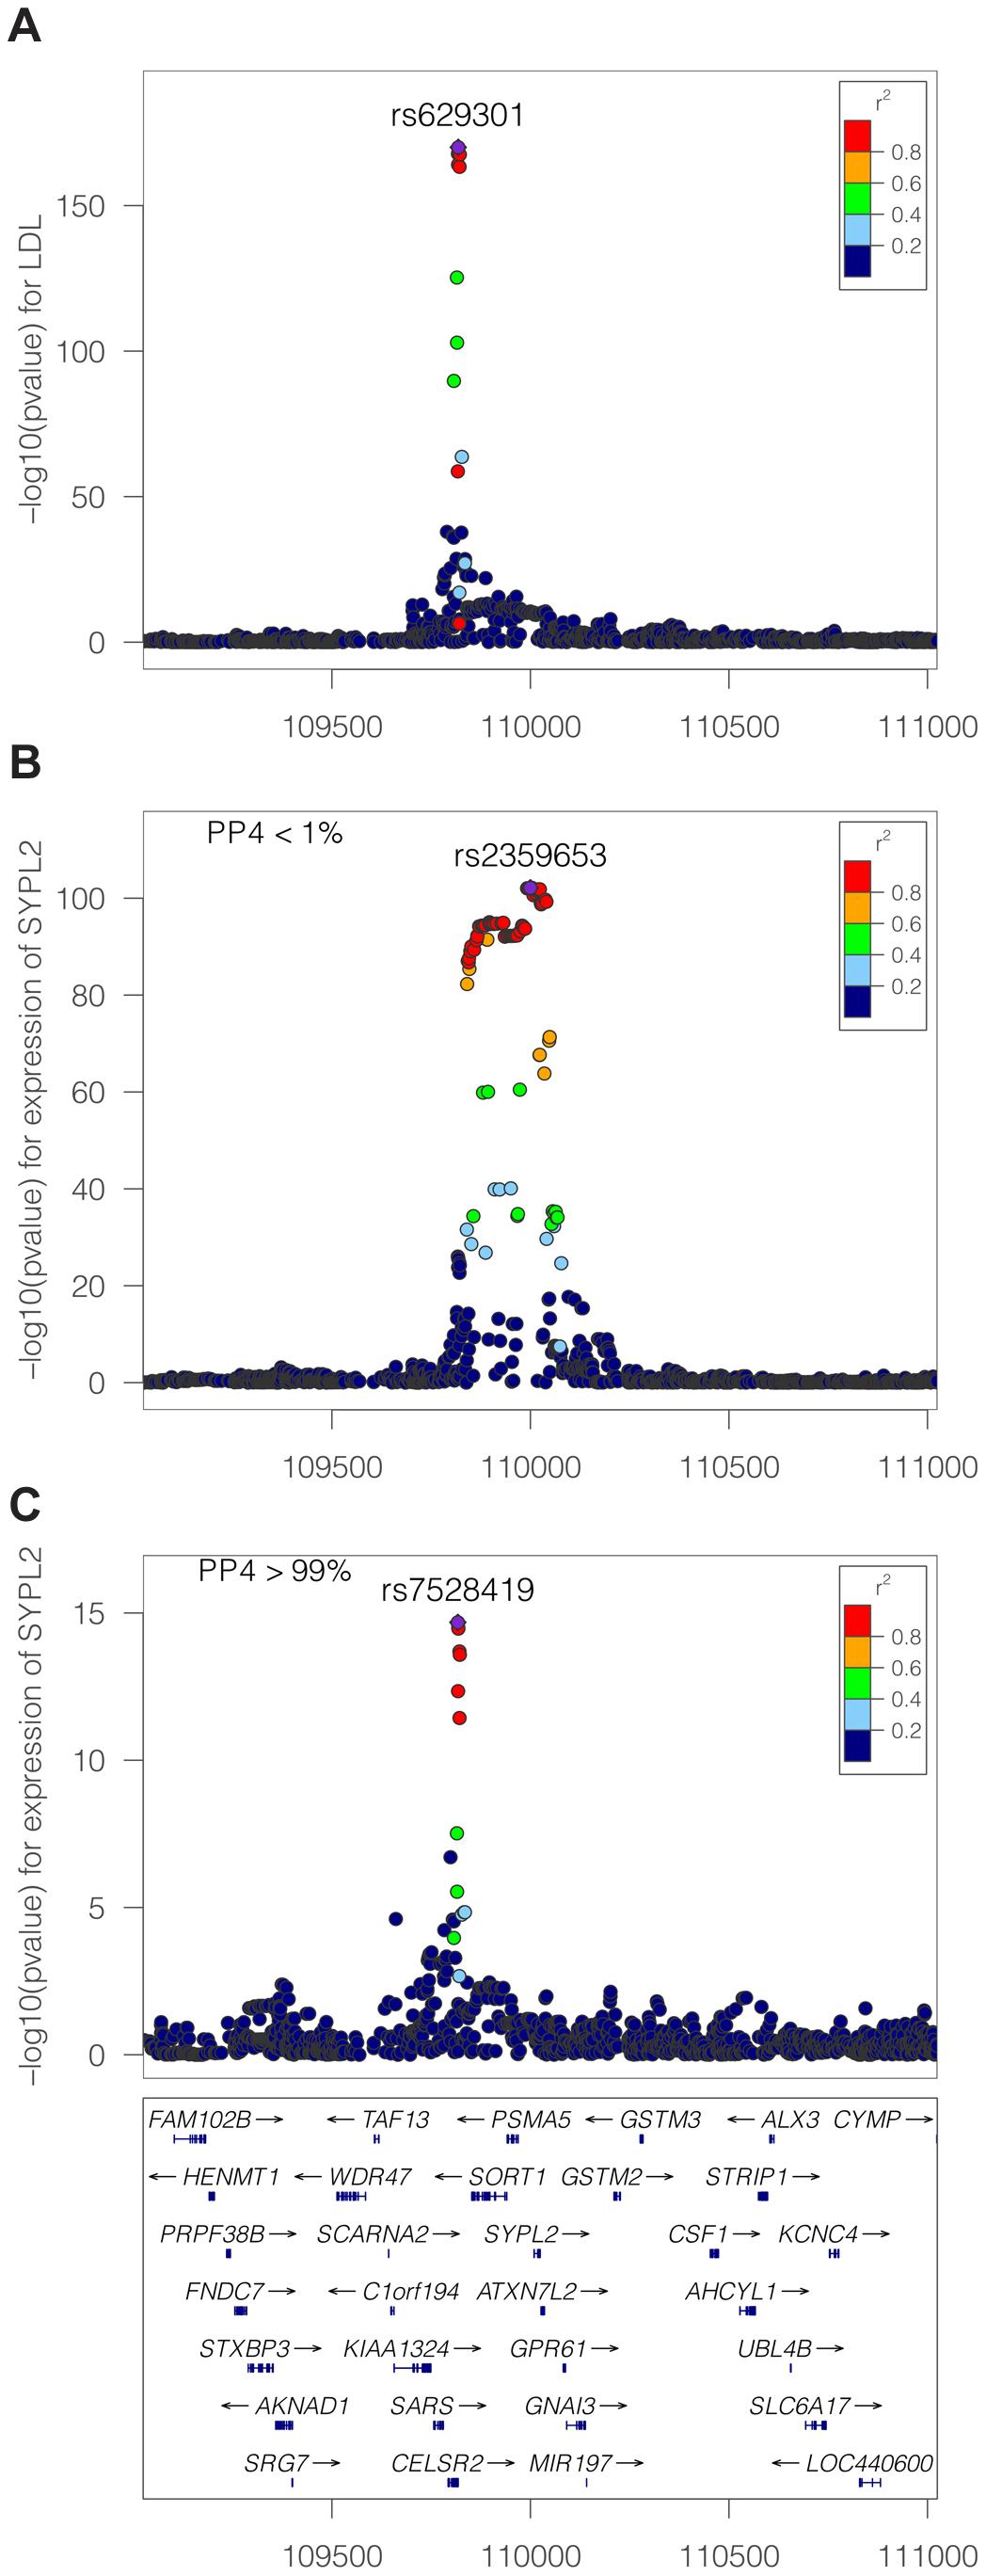 LDL association and eQTL association plots at the <i>SYPL2</i> locus.